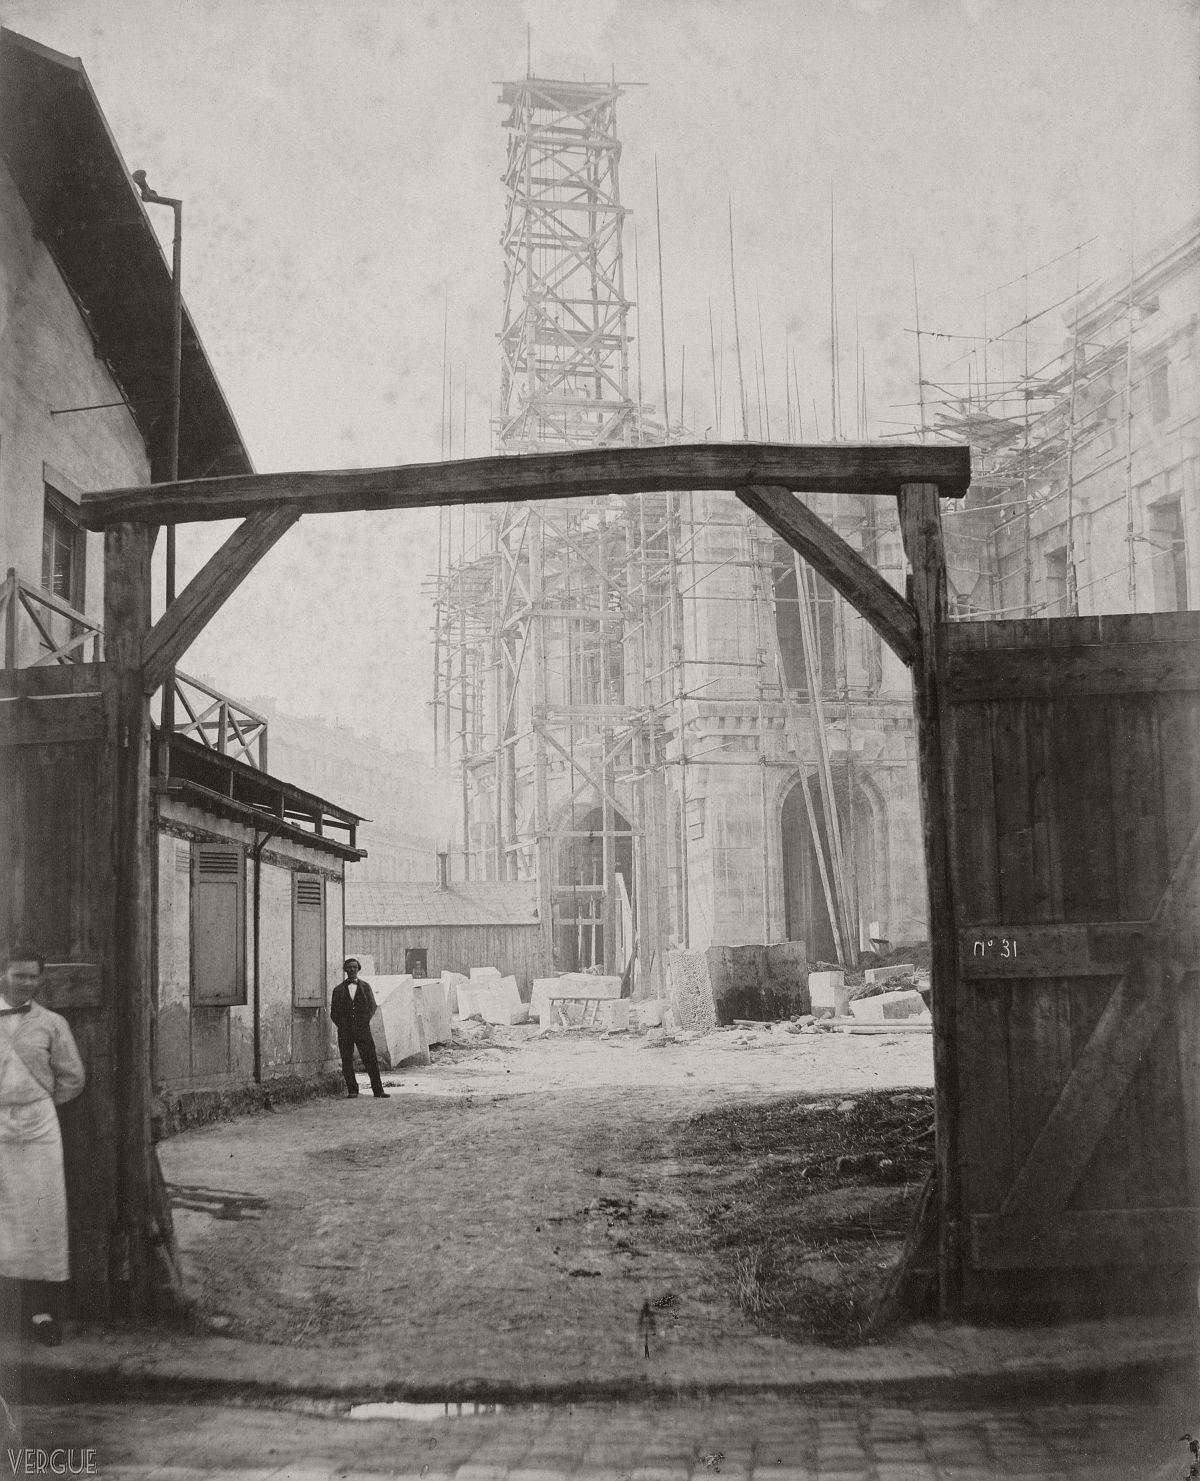 Pavillon des abonnés of the Opéra Garnier, Paris, France. 10 May 1865.